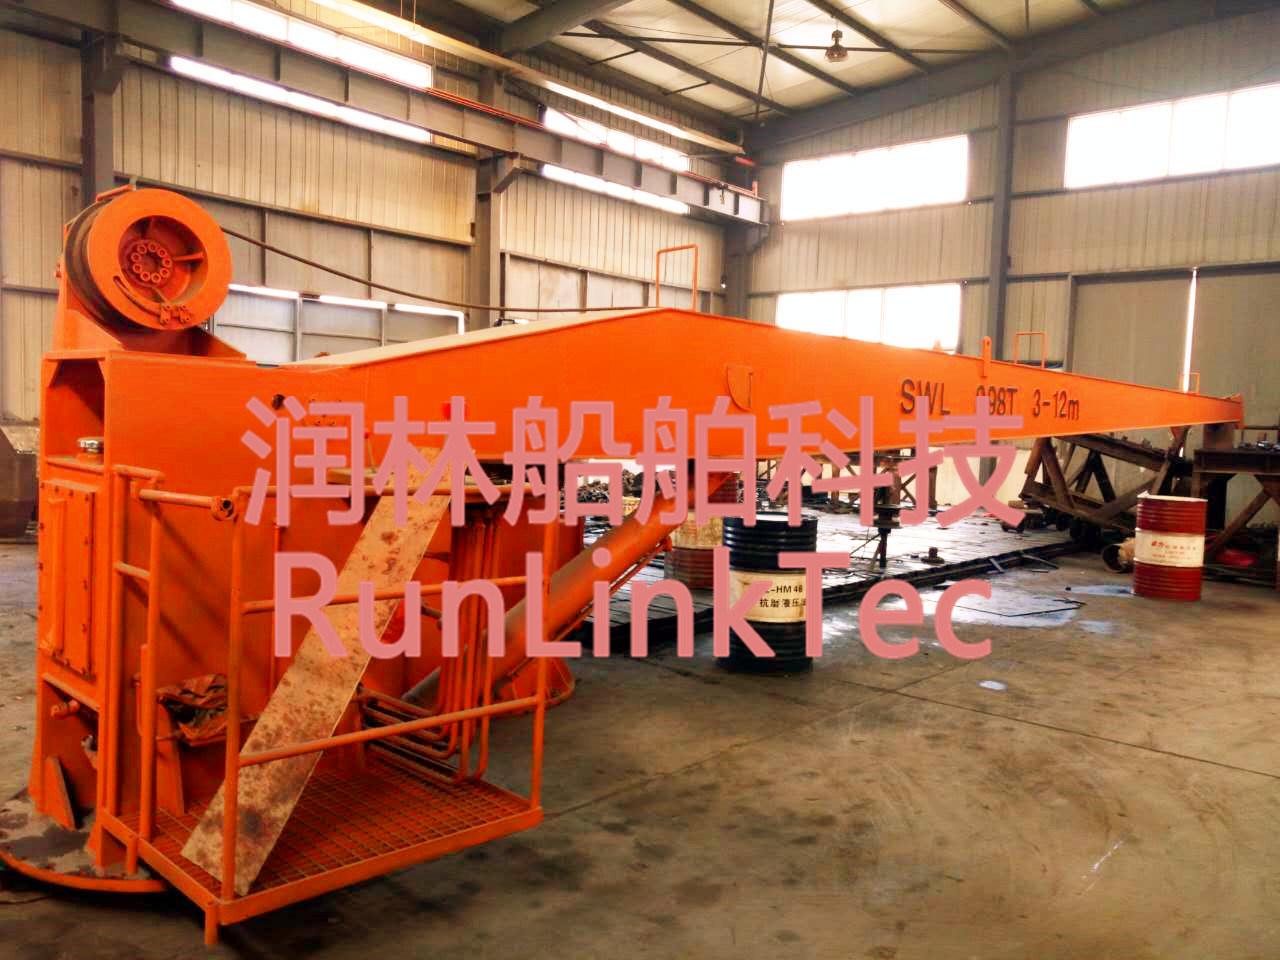 Slewing Crane/Marine Crane/Electrci/Hydraulic/Marine Equipment/Ship Building